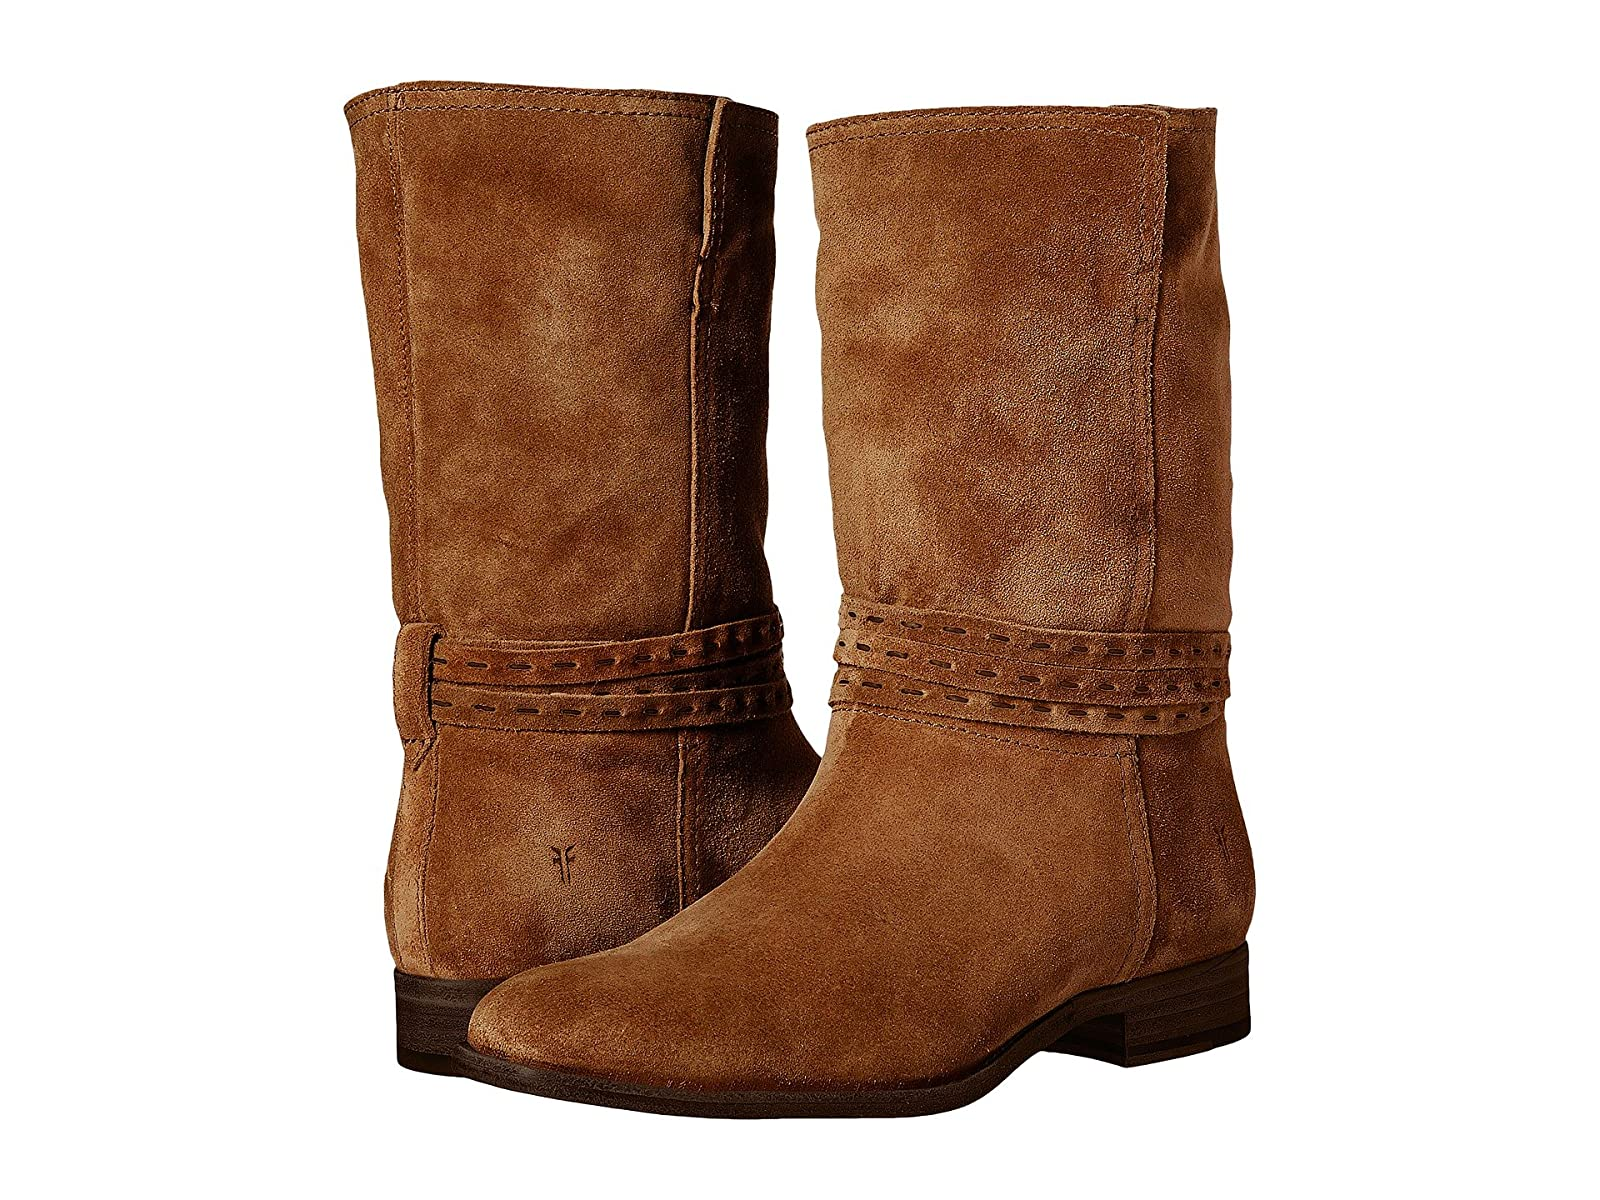 Frye Cara Pickstitch MidCheap and distinctive eye-catching shoes